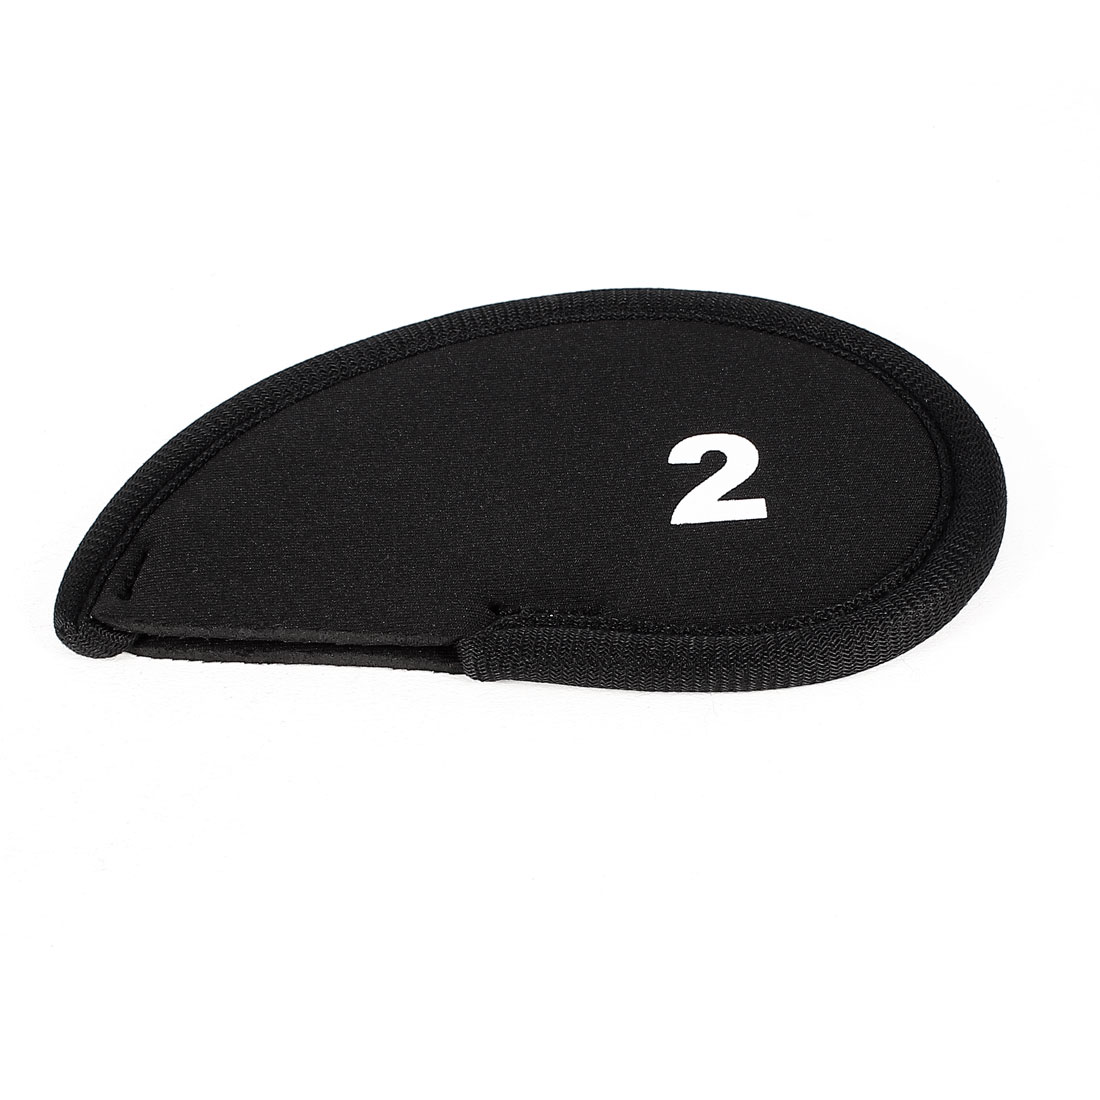 Black Neoprene Golf Club Head Cover 2 Wedge Iron Protective Headcovers